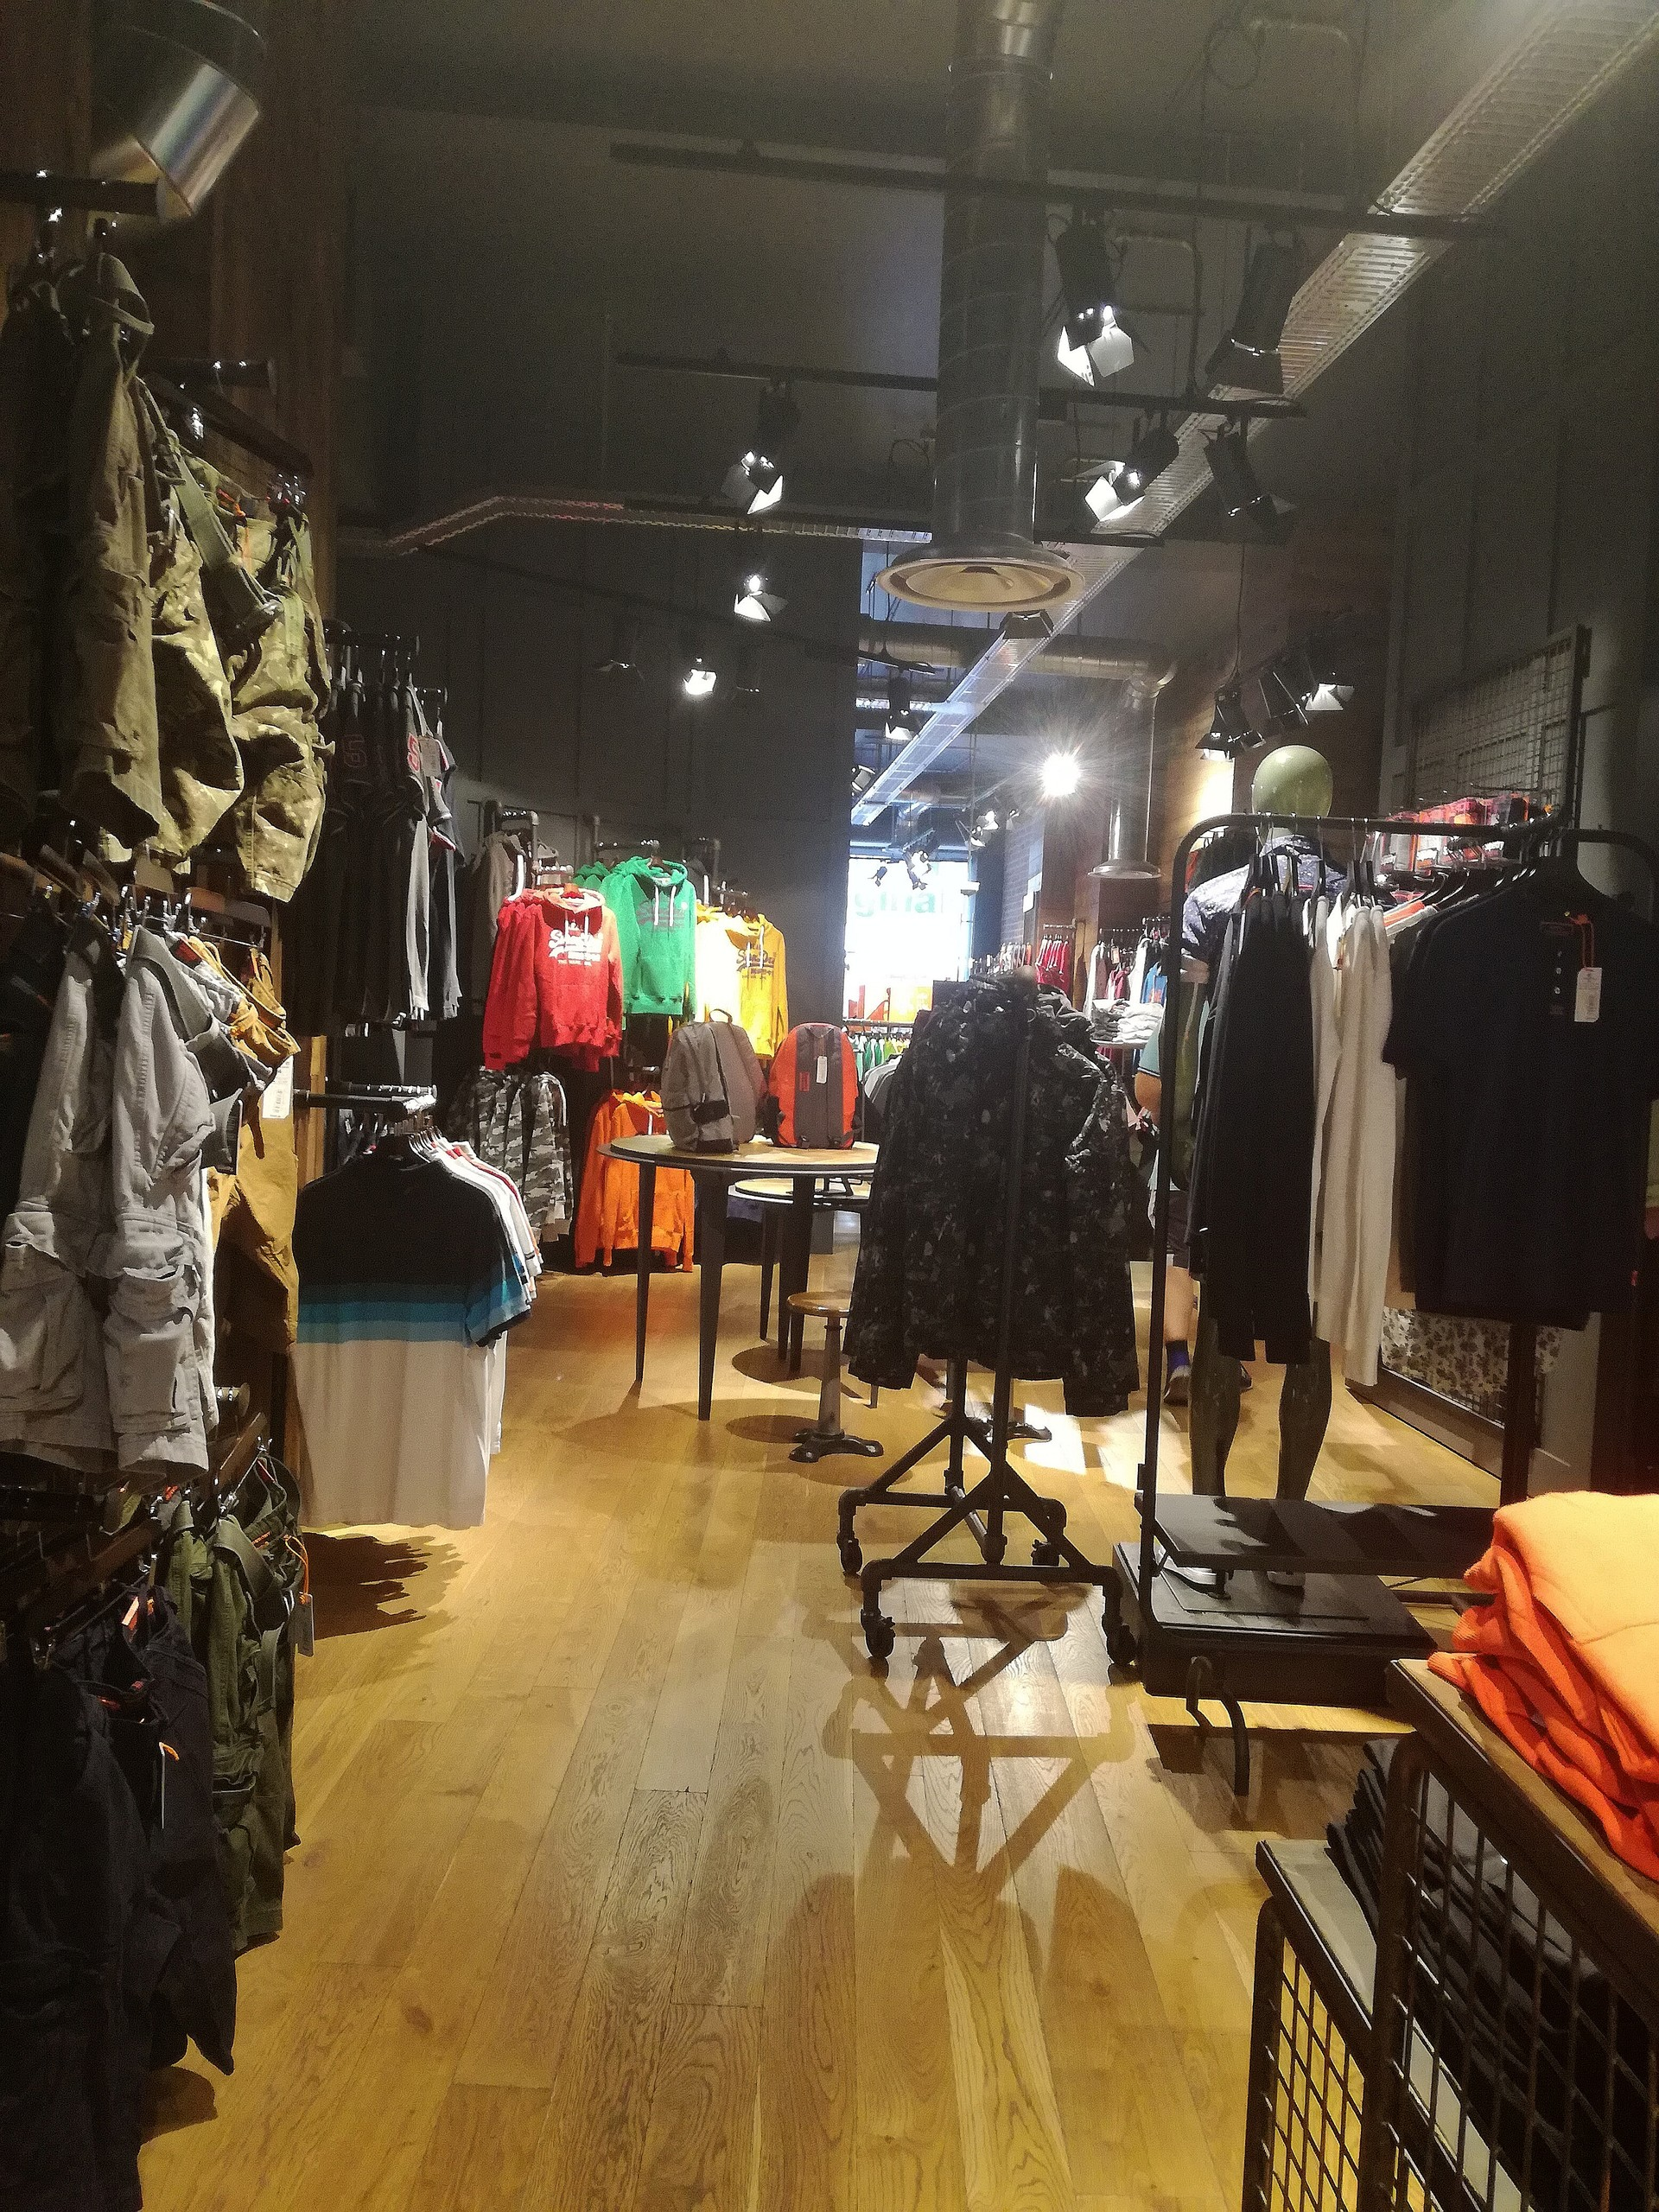 a616c0ef39 tiendas-ropa-suecia-b2ff463ec734948b24b1